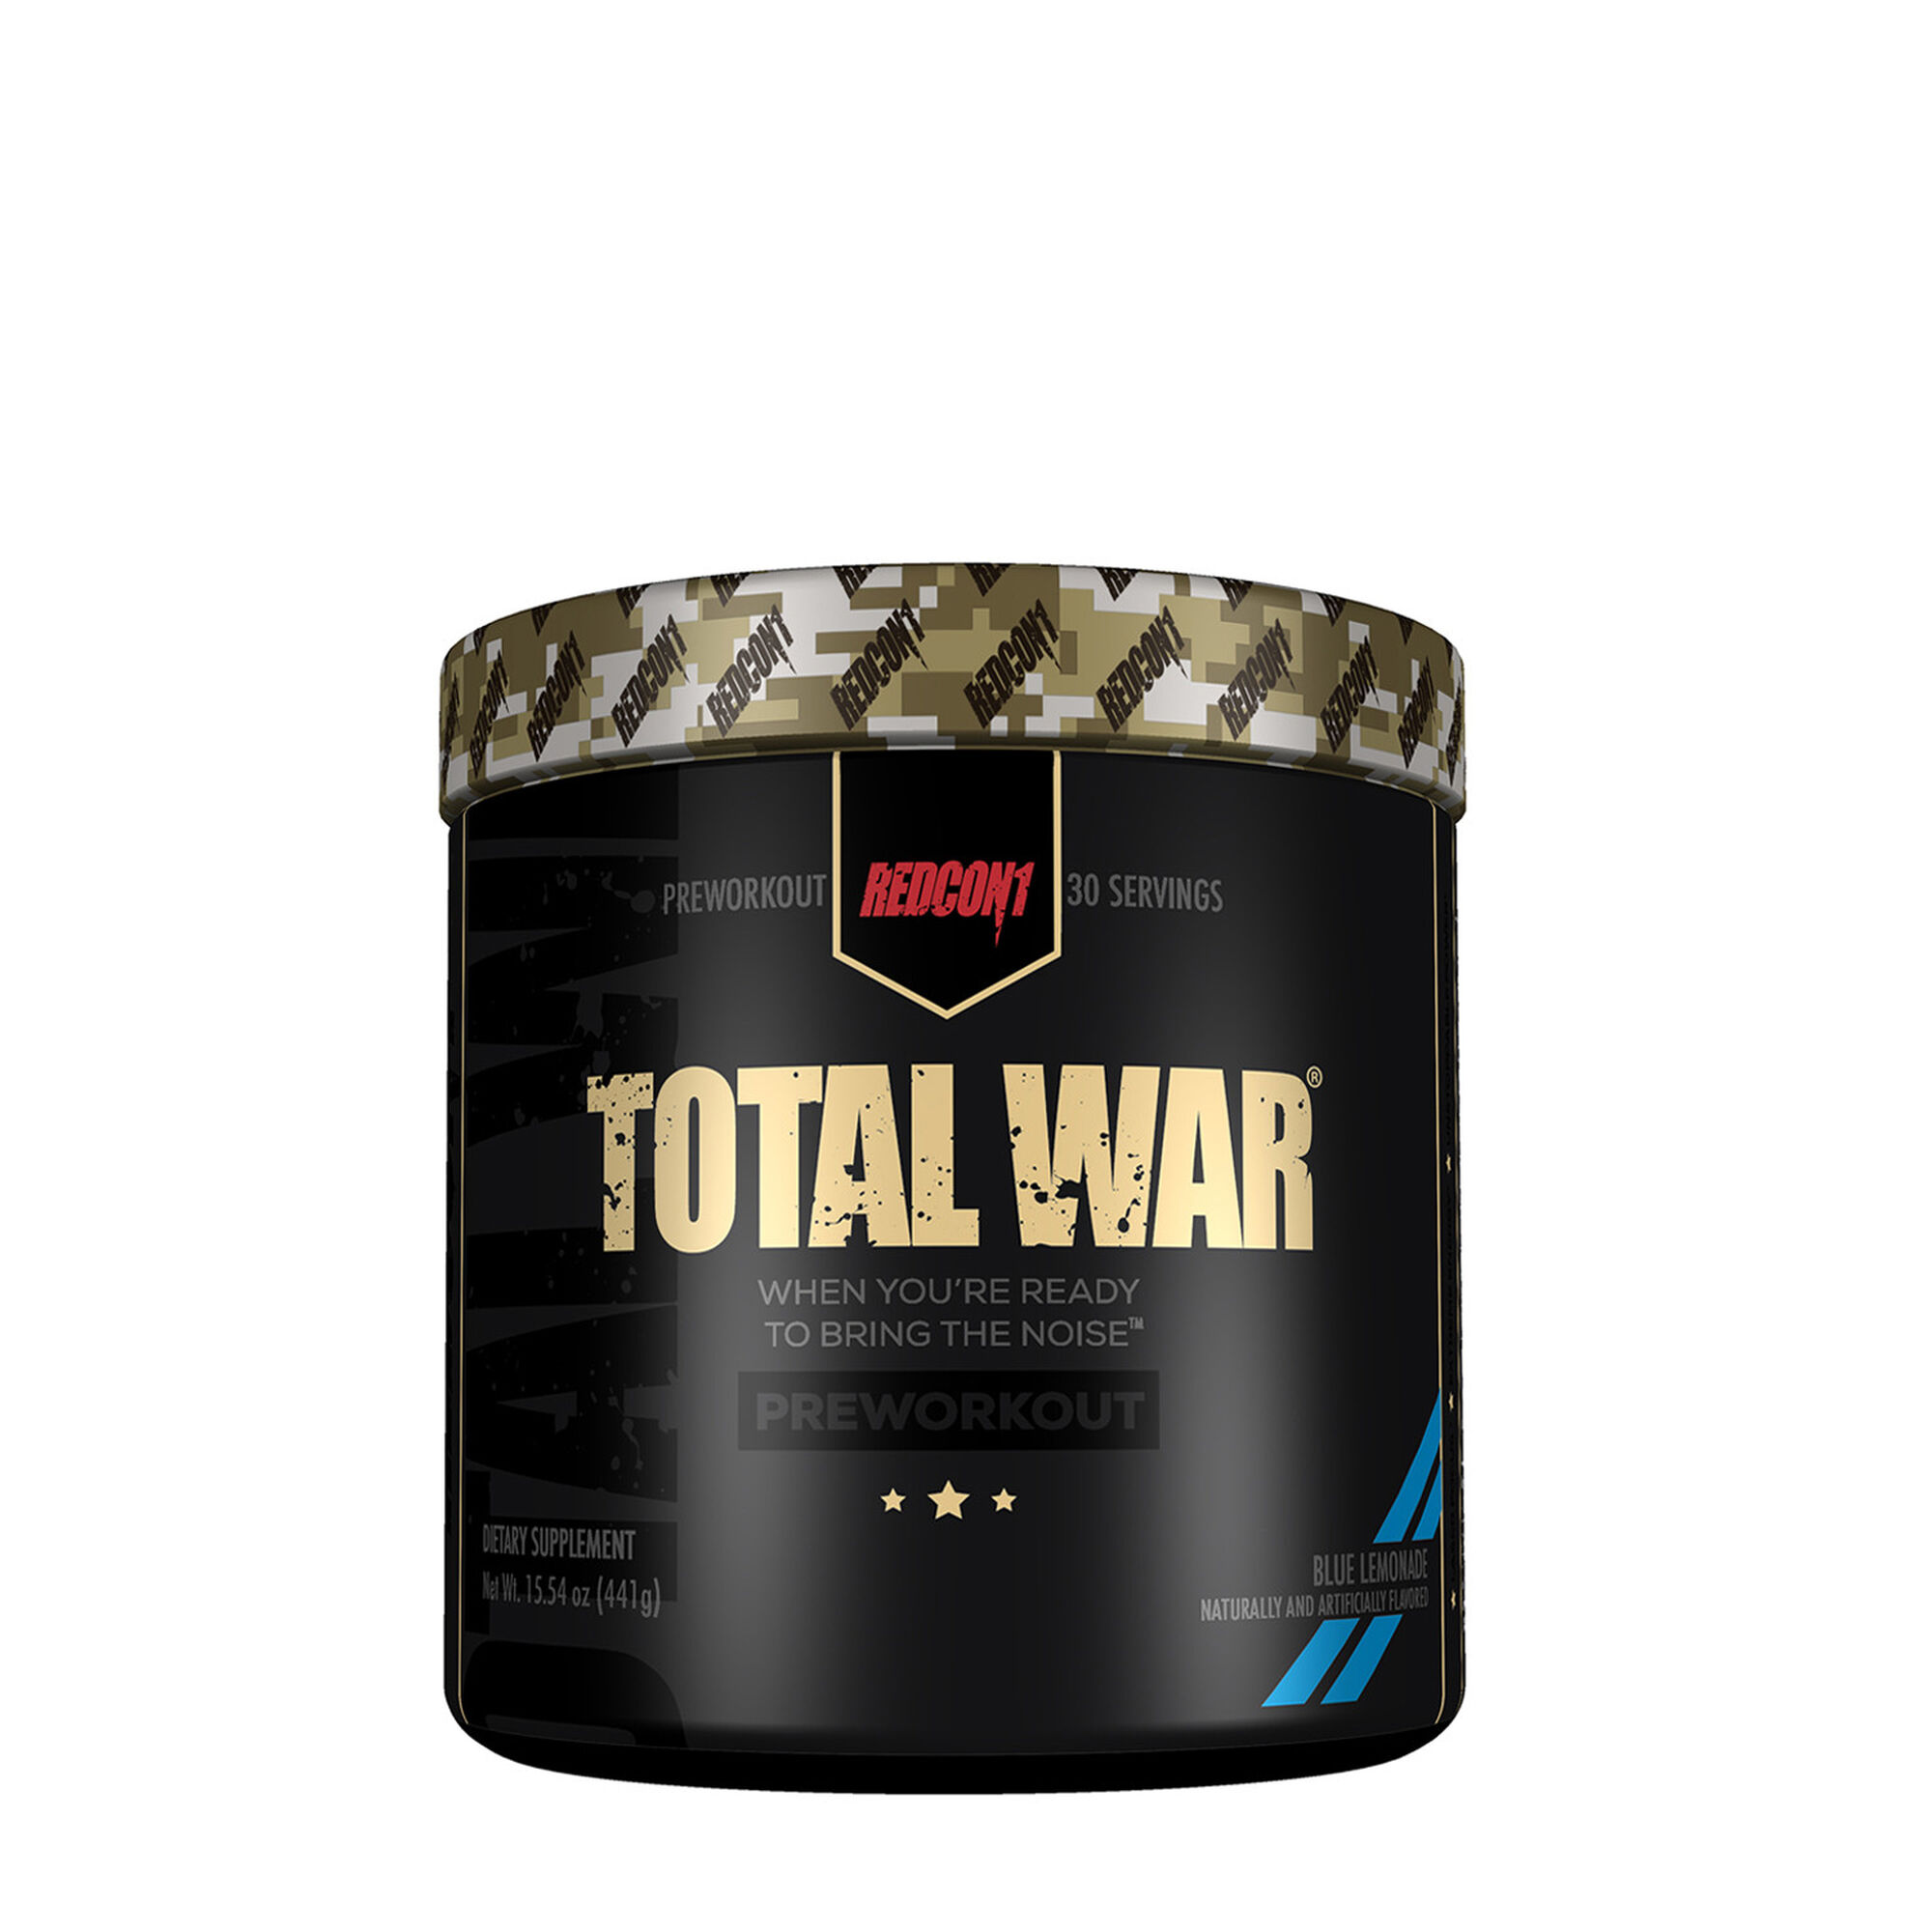 Redcon1 Total War Pre Workout Supplement Blue Lemonade Gnc